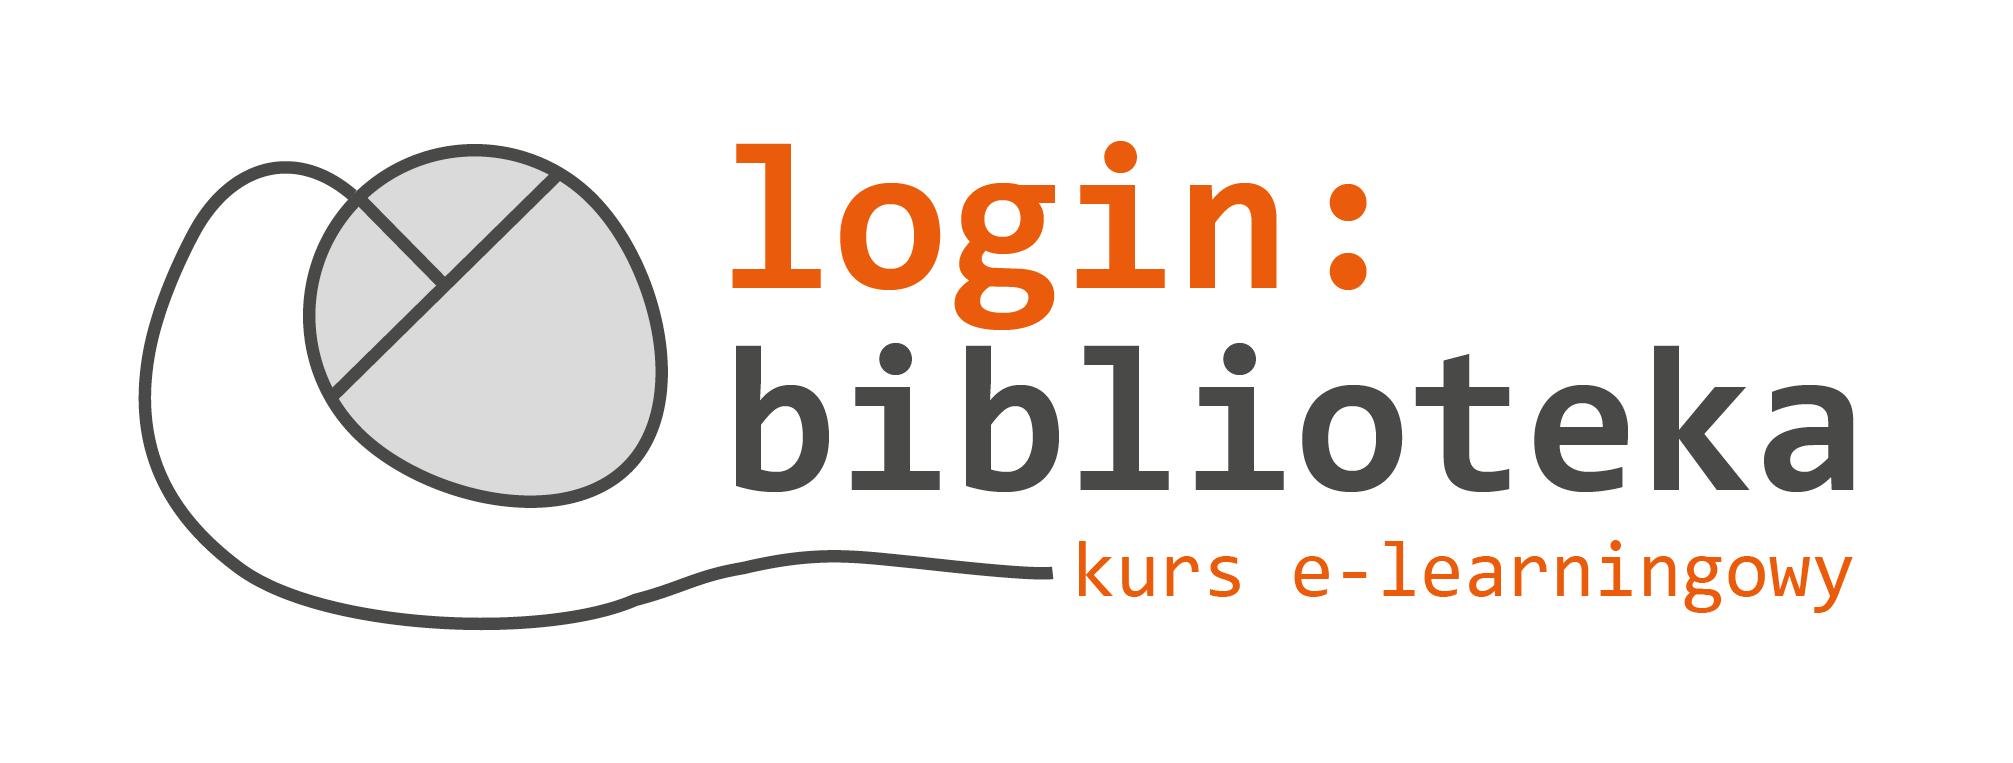 login-biblioteka-logo-300dpi